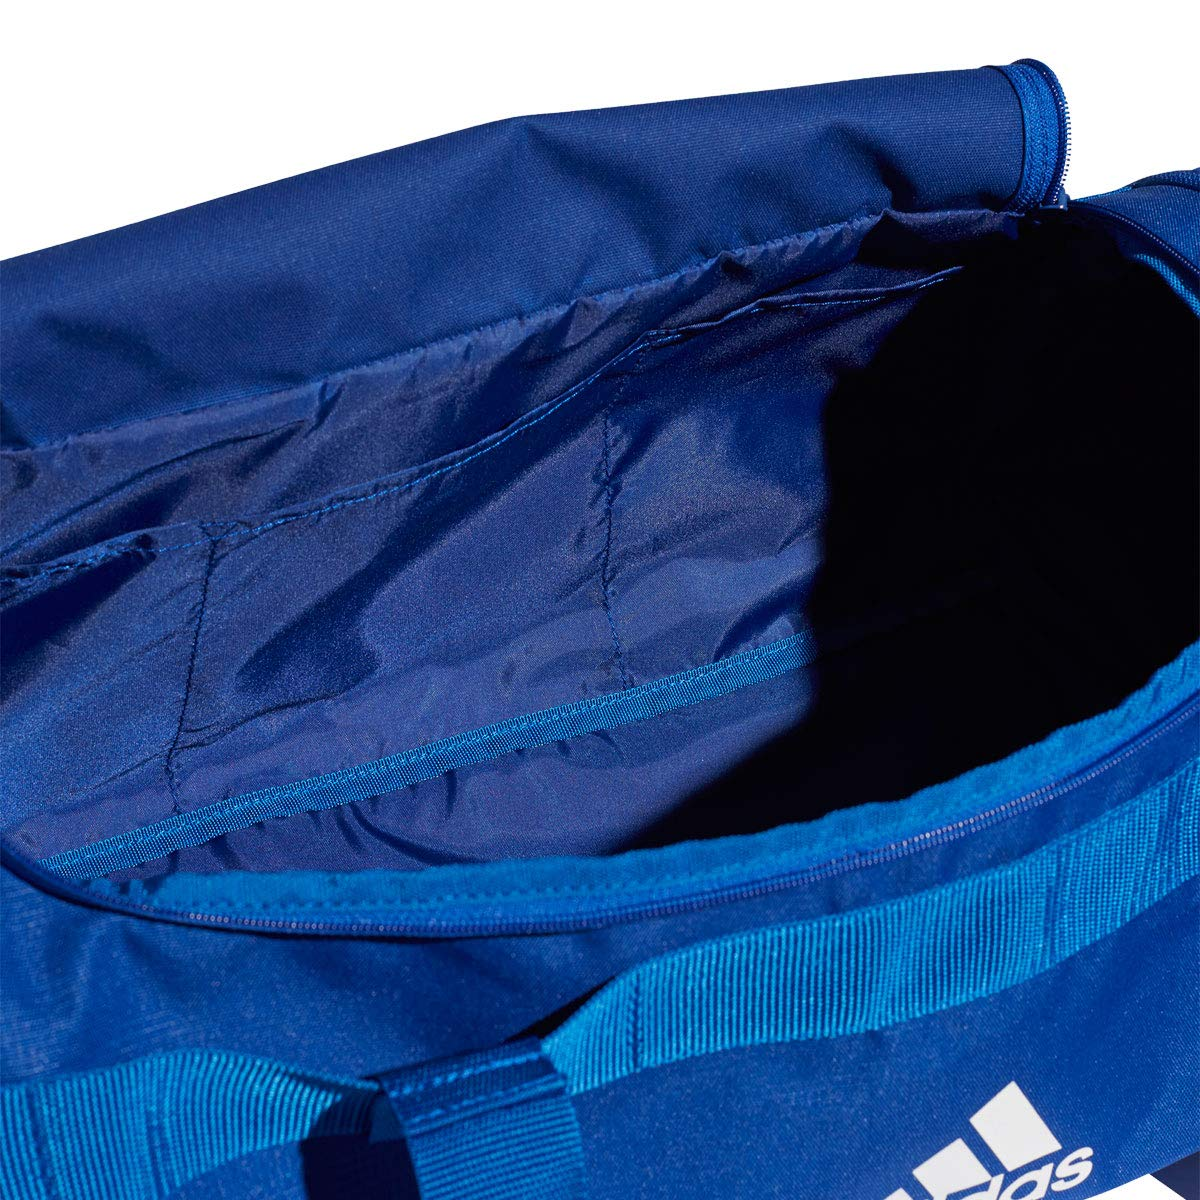 694ebb58ab adidas Convertible 3-Streifen Duffelbag, Set di asaiugamani Uomo, Blu  (Reauni/Blanco), 45 Centimeters: Amazon.it: Sport e tempo libero